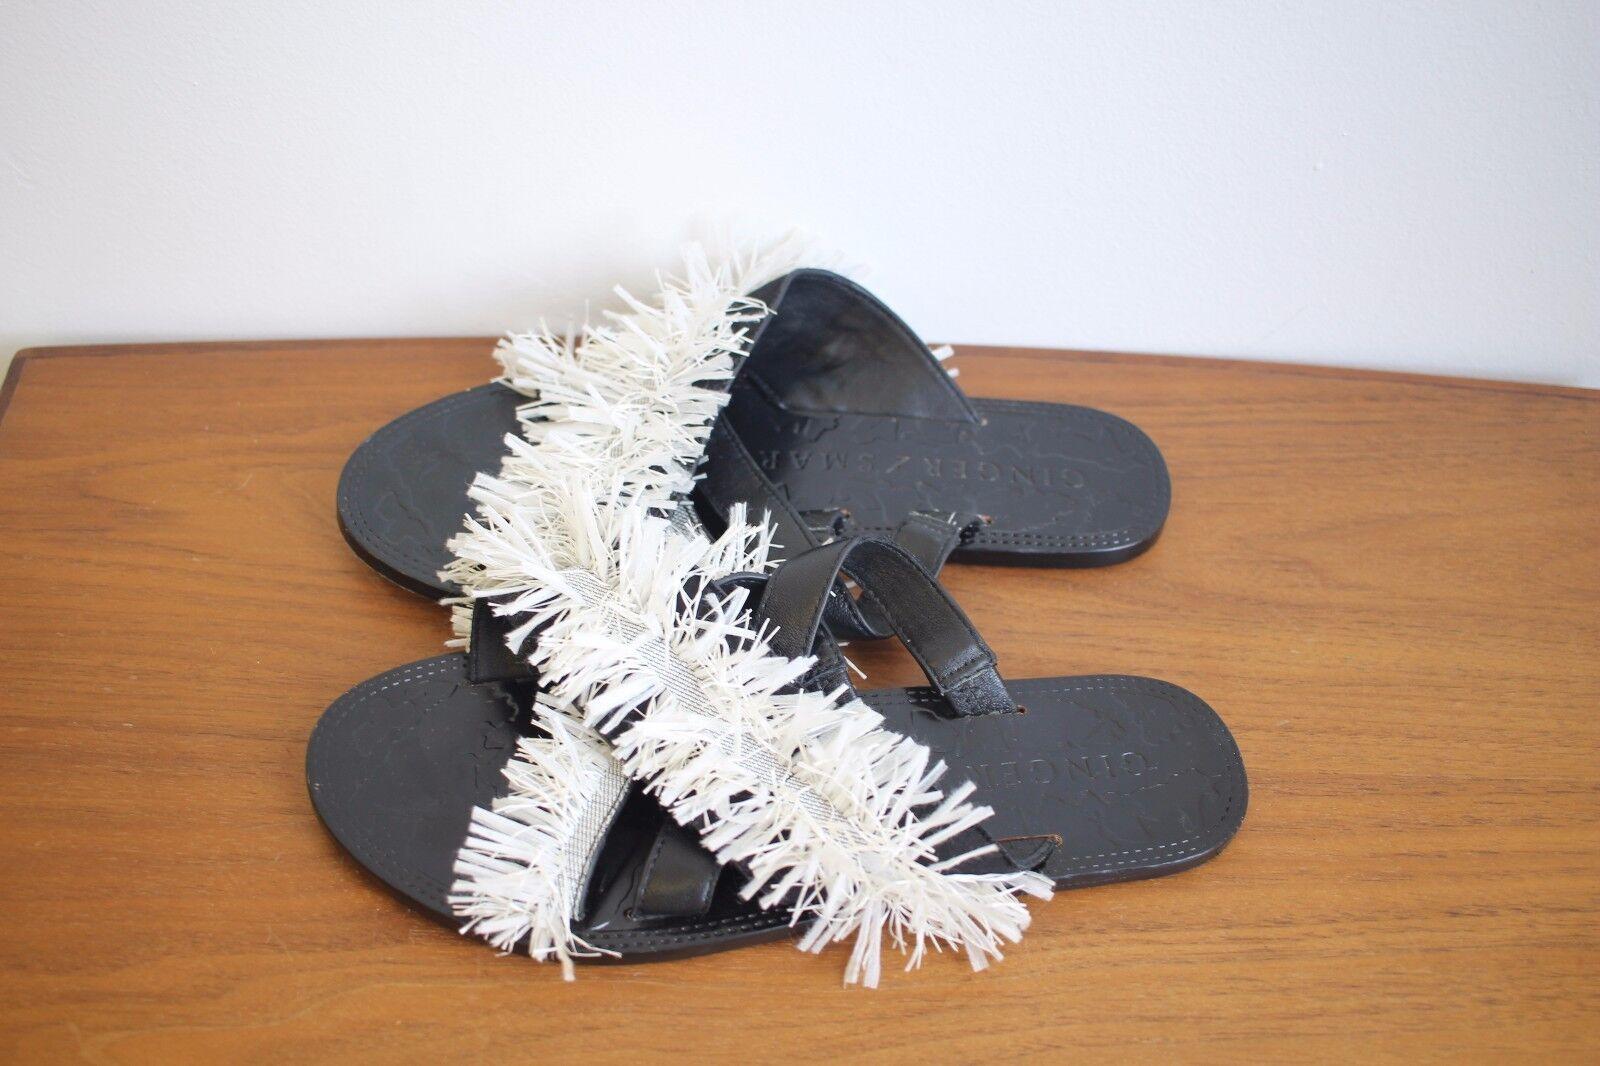 Ginger & and Sandal Smart: Tectonic Raffia Leather Slide Sandal and  $359 3437ff